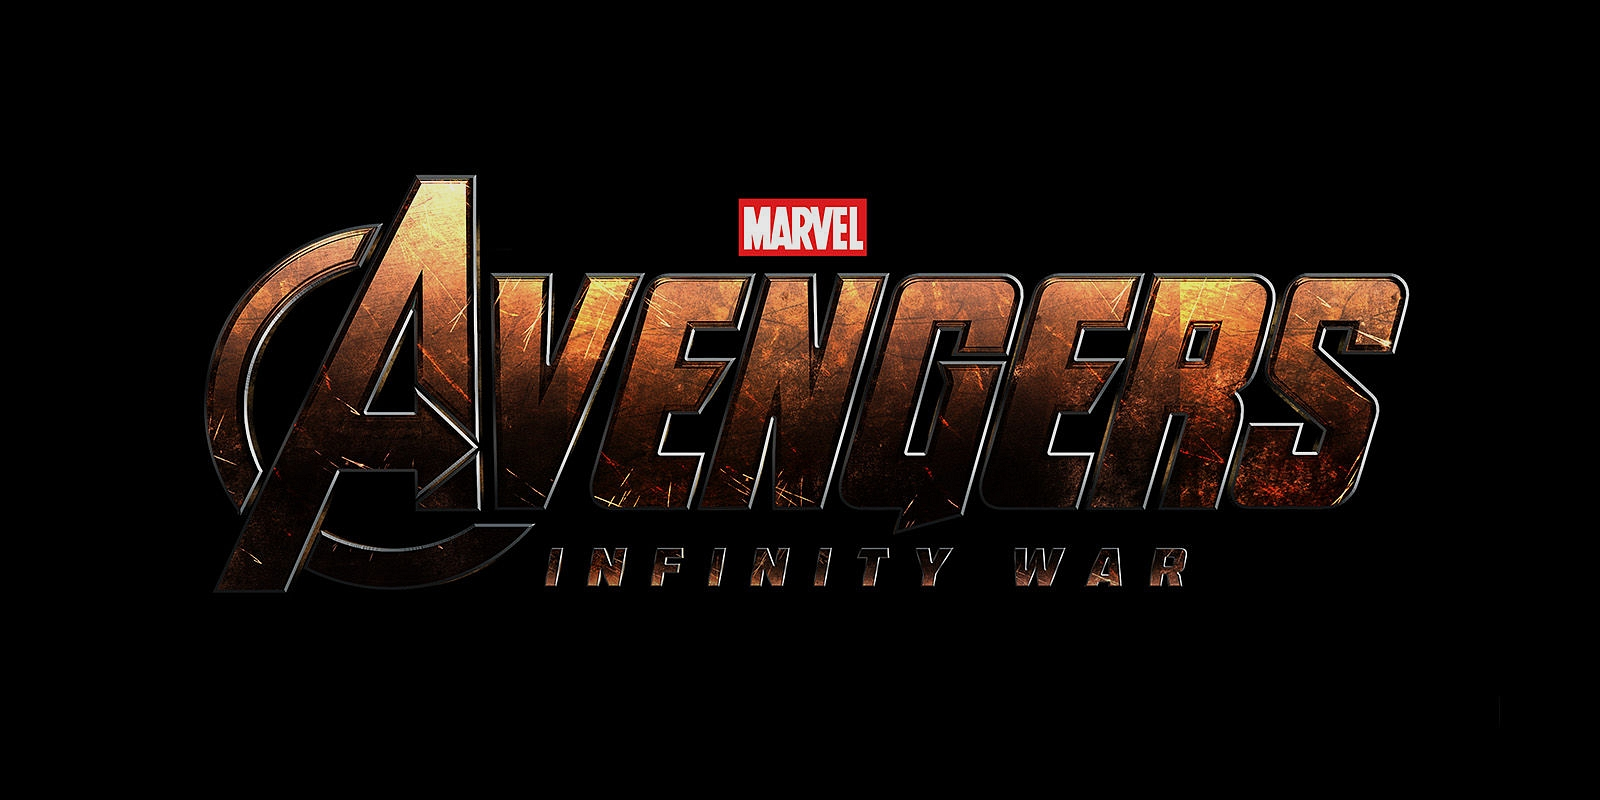 Avengers: Infinity War part I